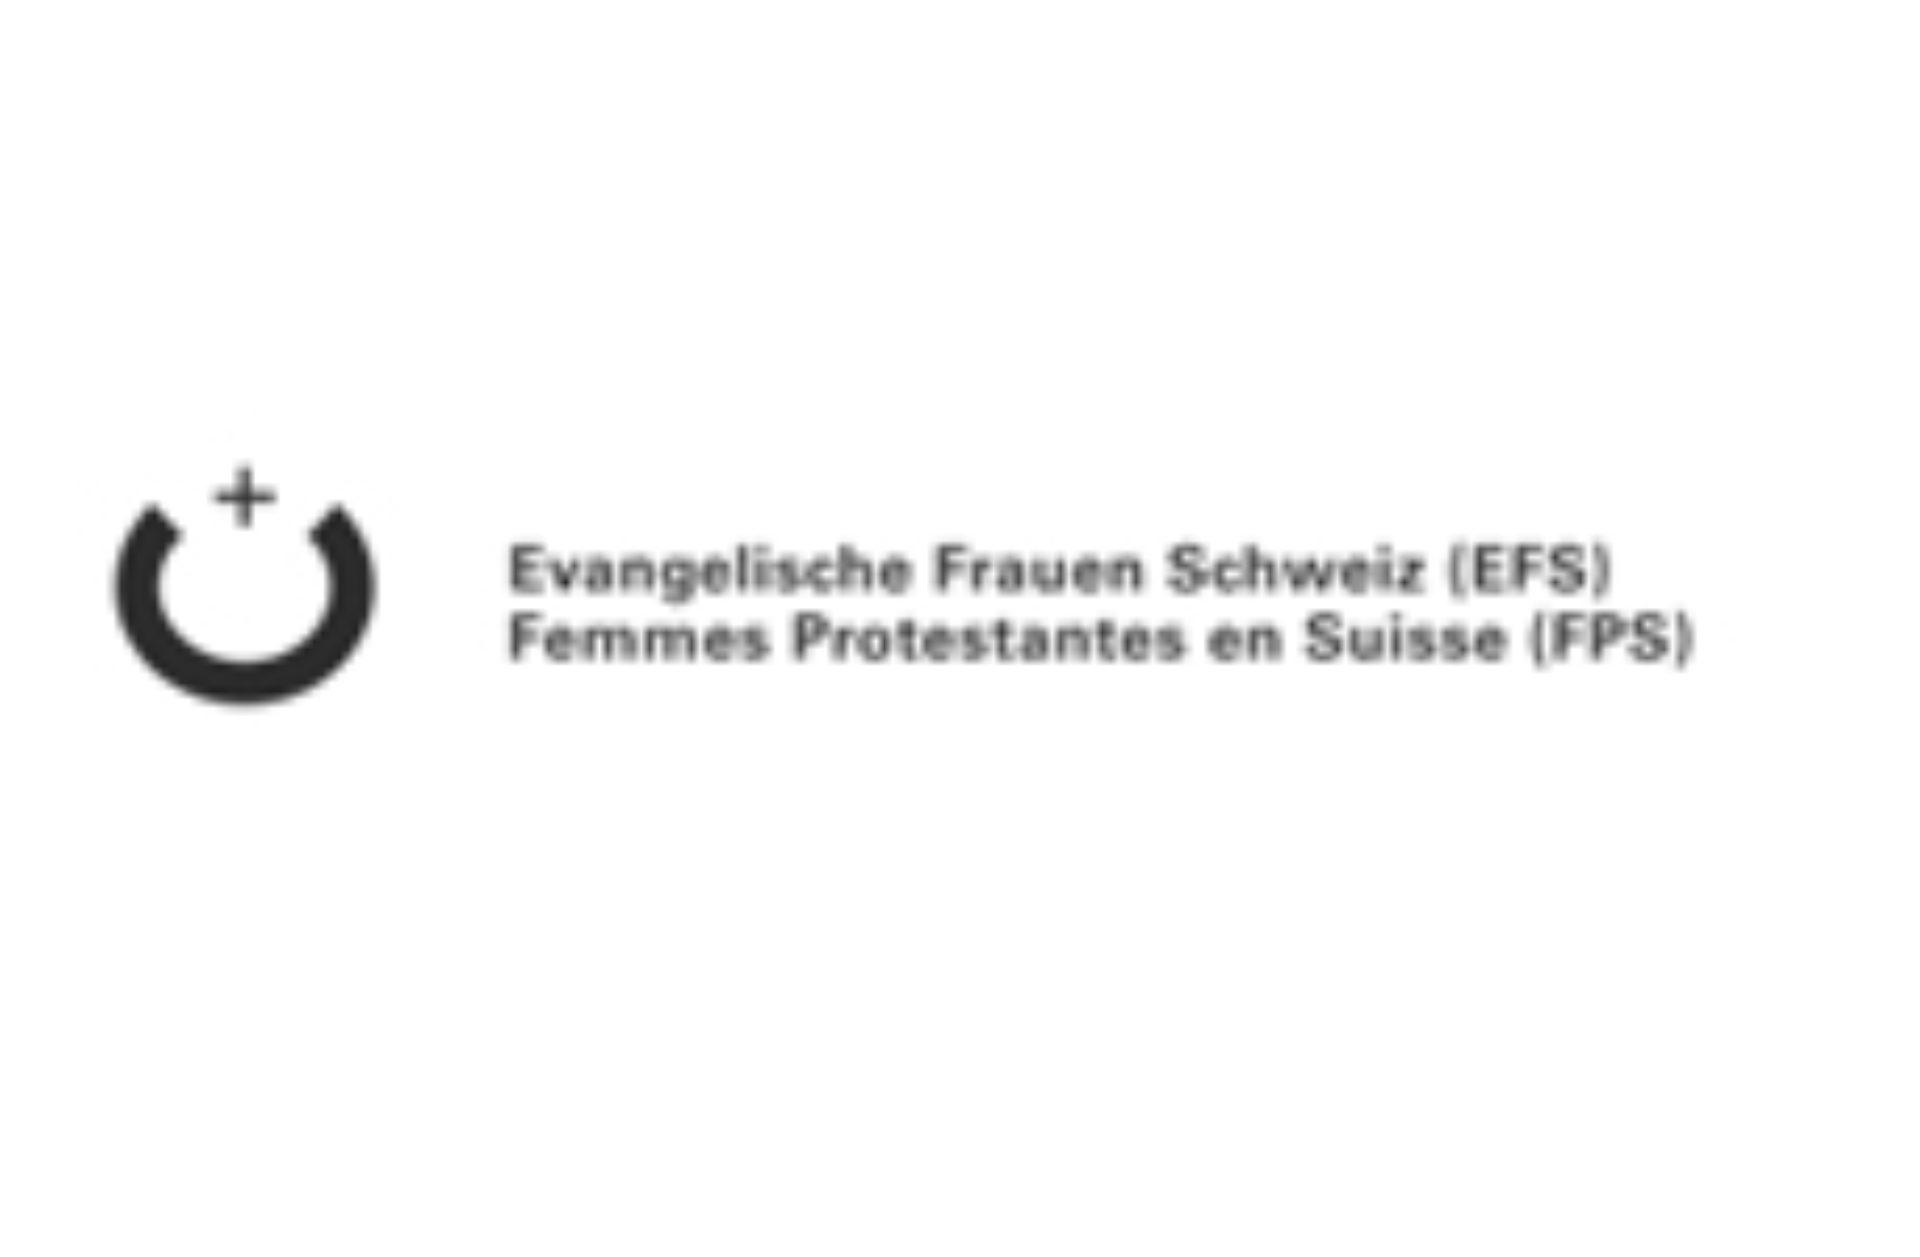 Evangelische Frauen Schweiz